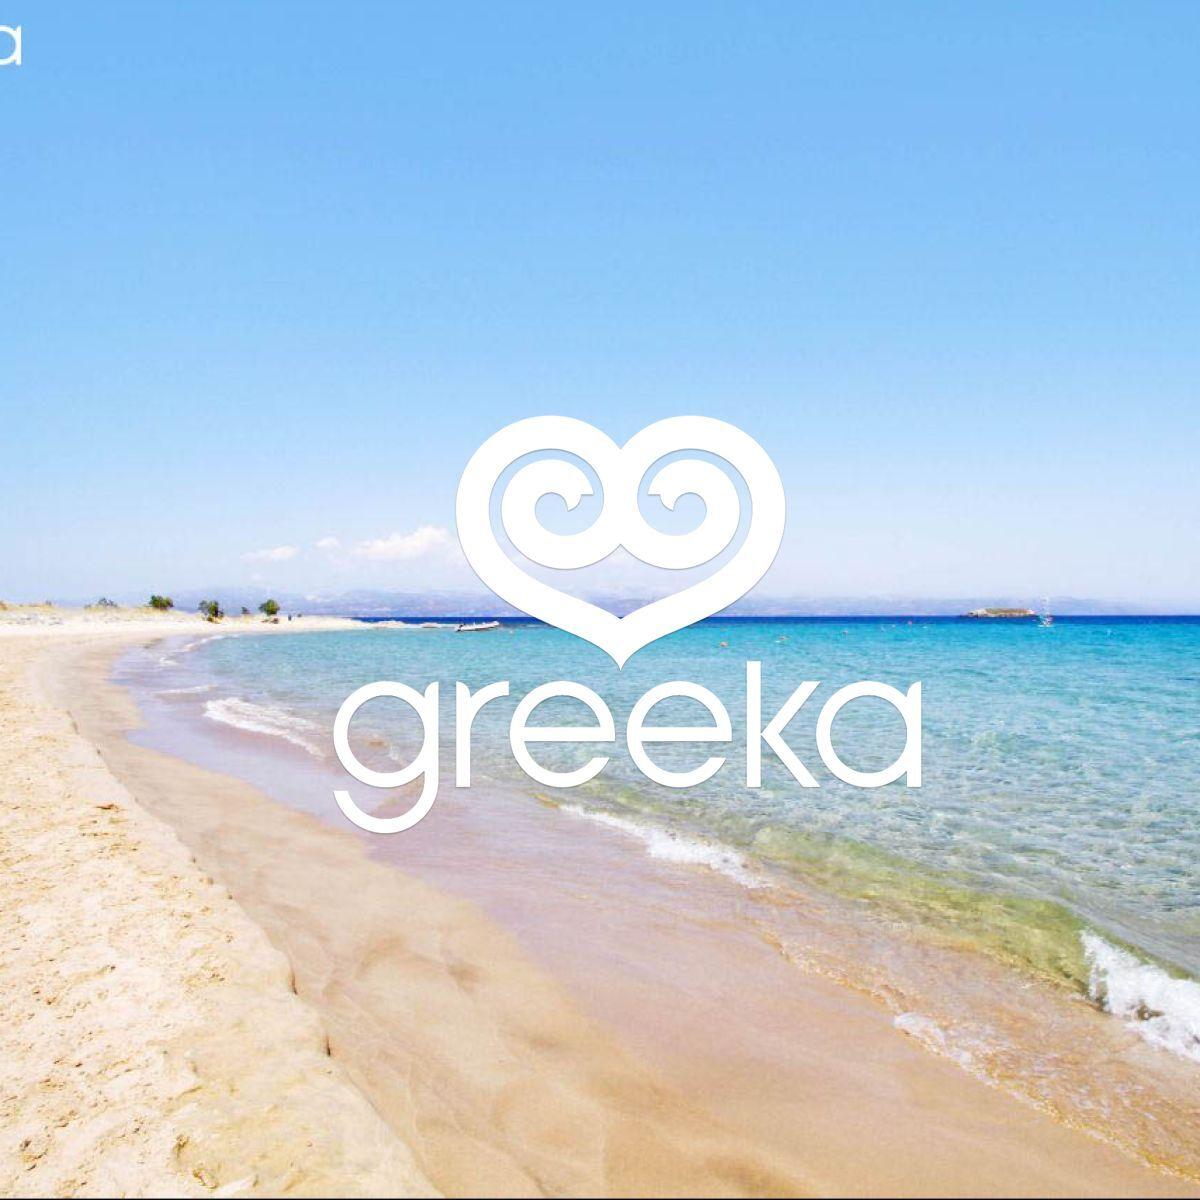 Paros Beaches: Beaches In Paros - Greeka.com